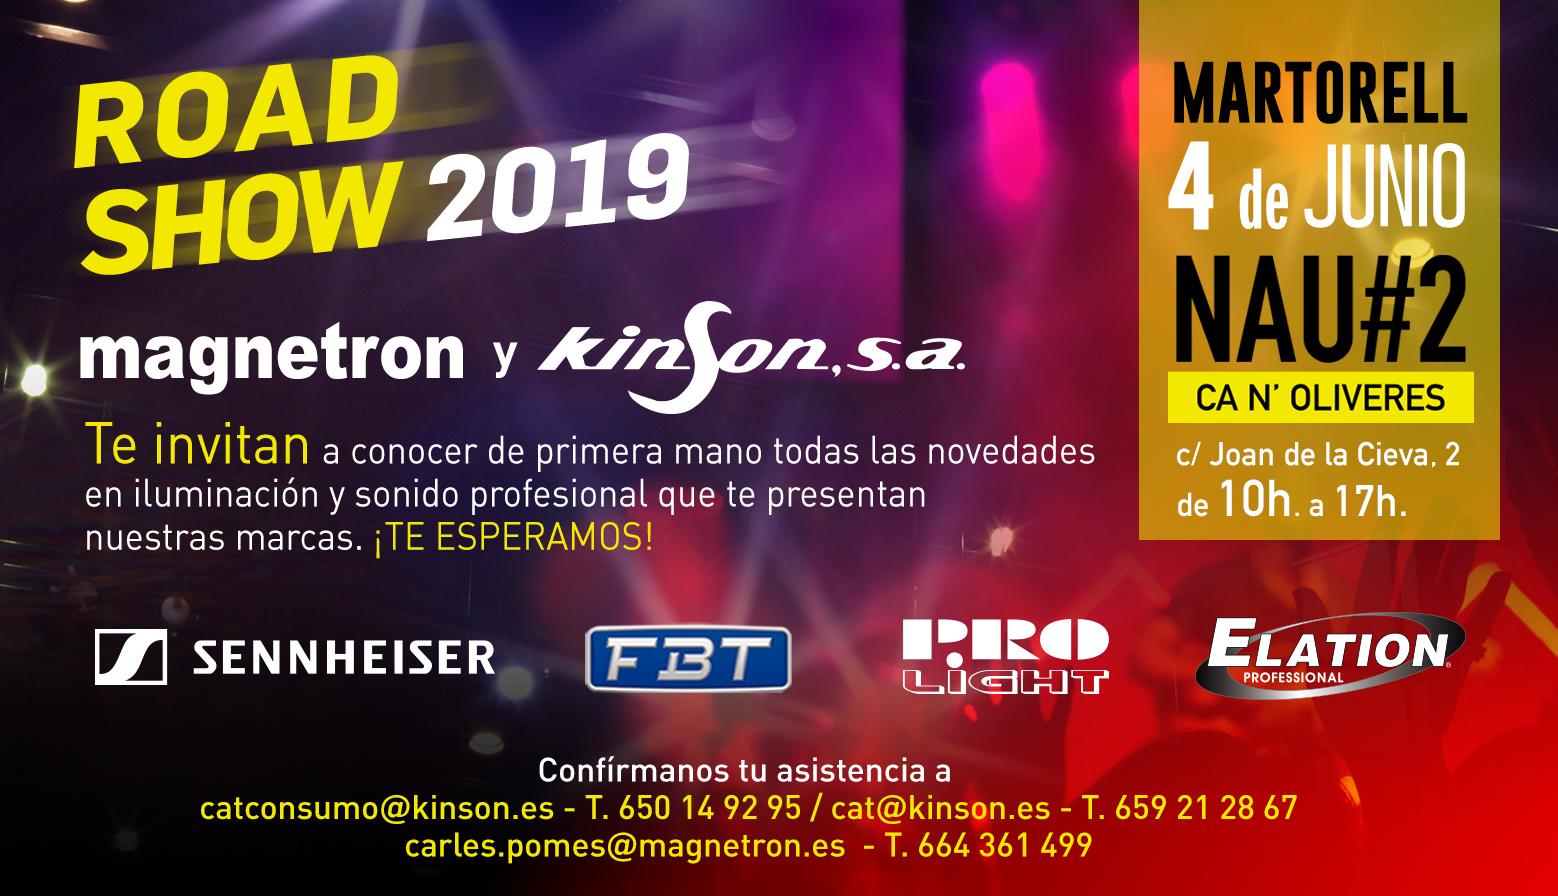 Road Show magnetron y kinson